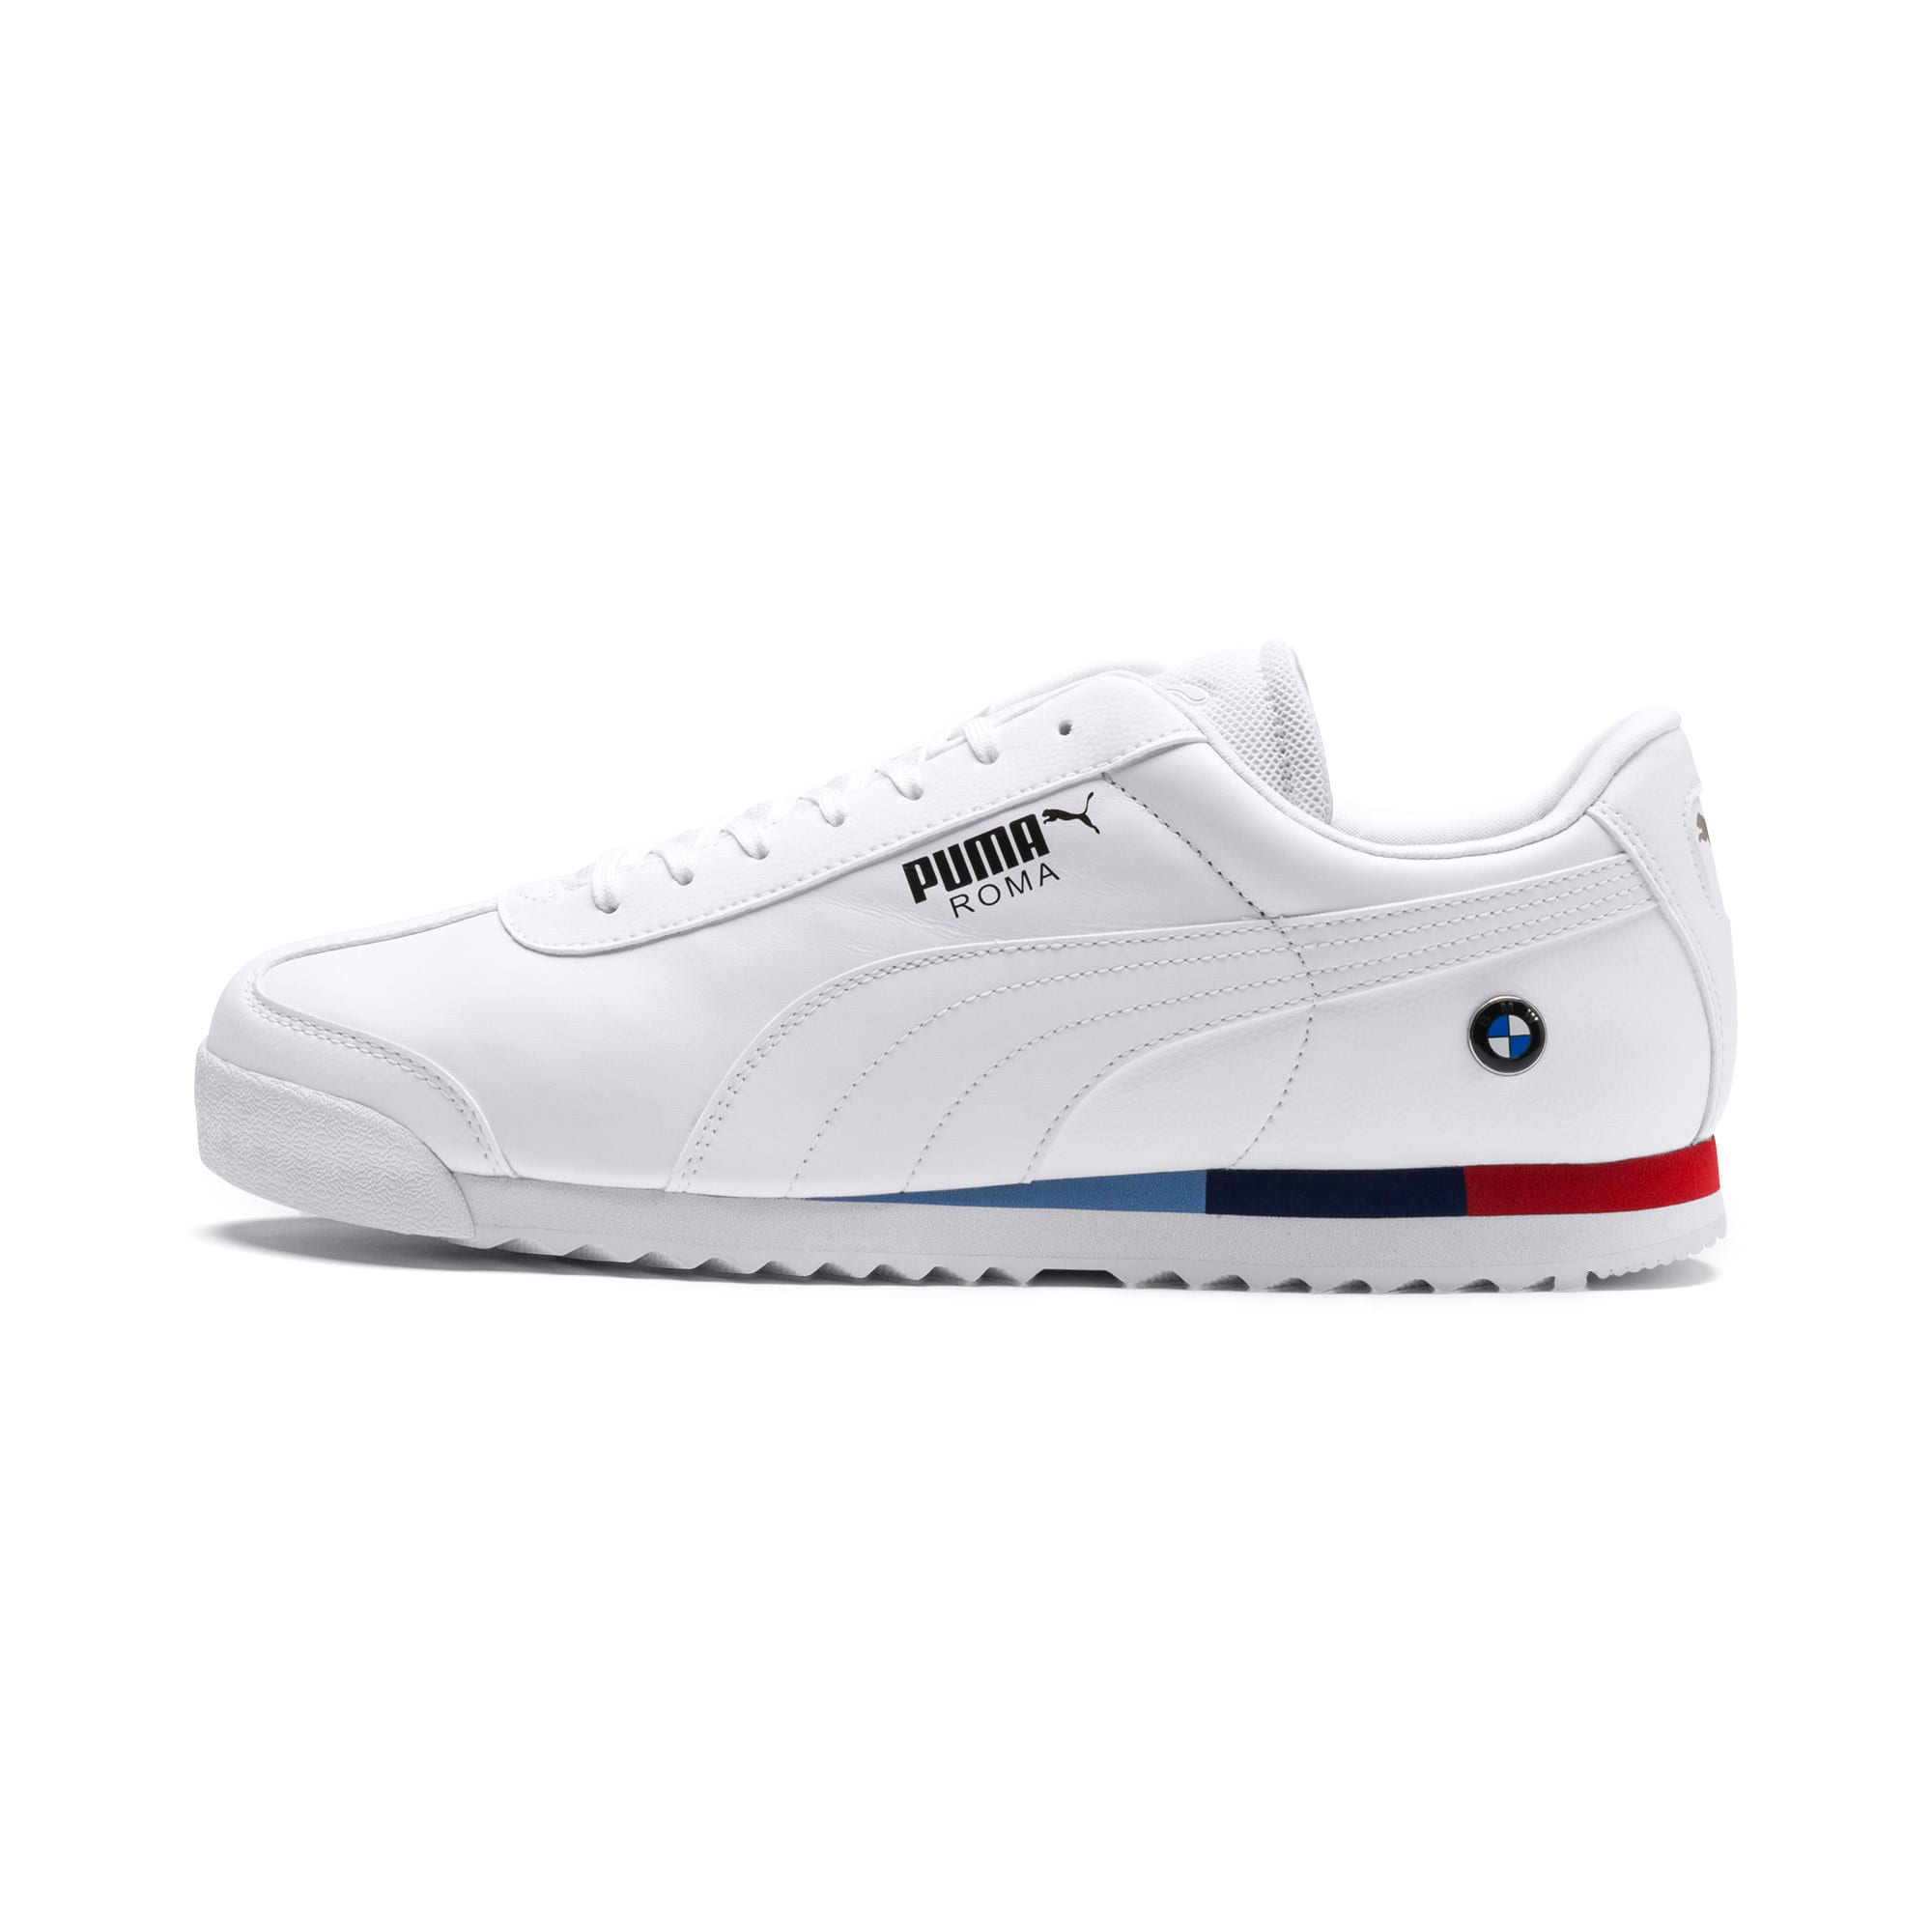 Thumbnail 1 of BMW MMS Roma sneakers voor heren, Puma White-Puma White, medium